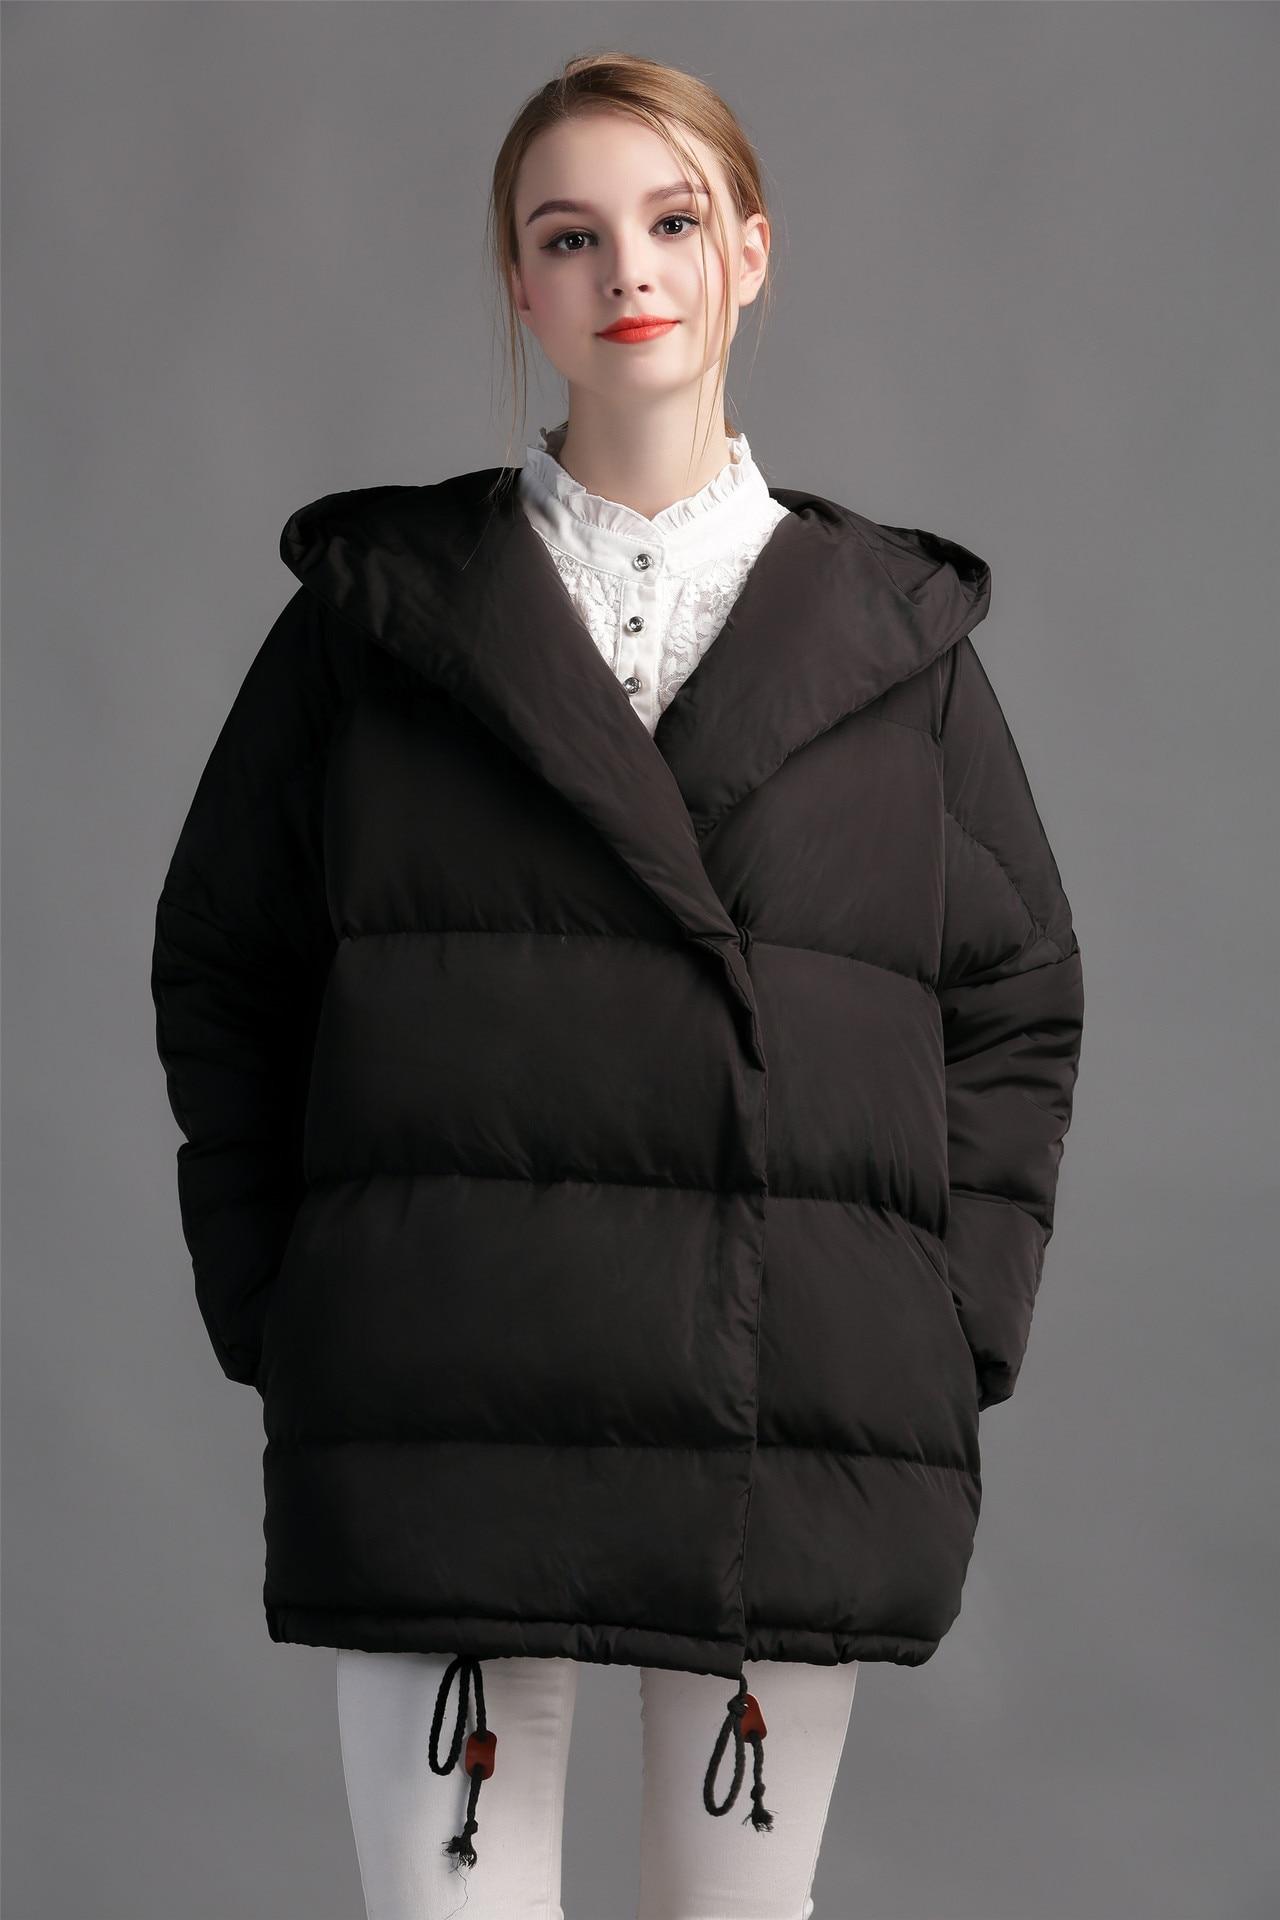 online cheap duvet jacket women aliexpress alibaba group #2: coats quilt size plus font b duvet b font loose fit font b jacket b font